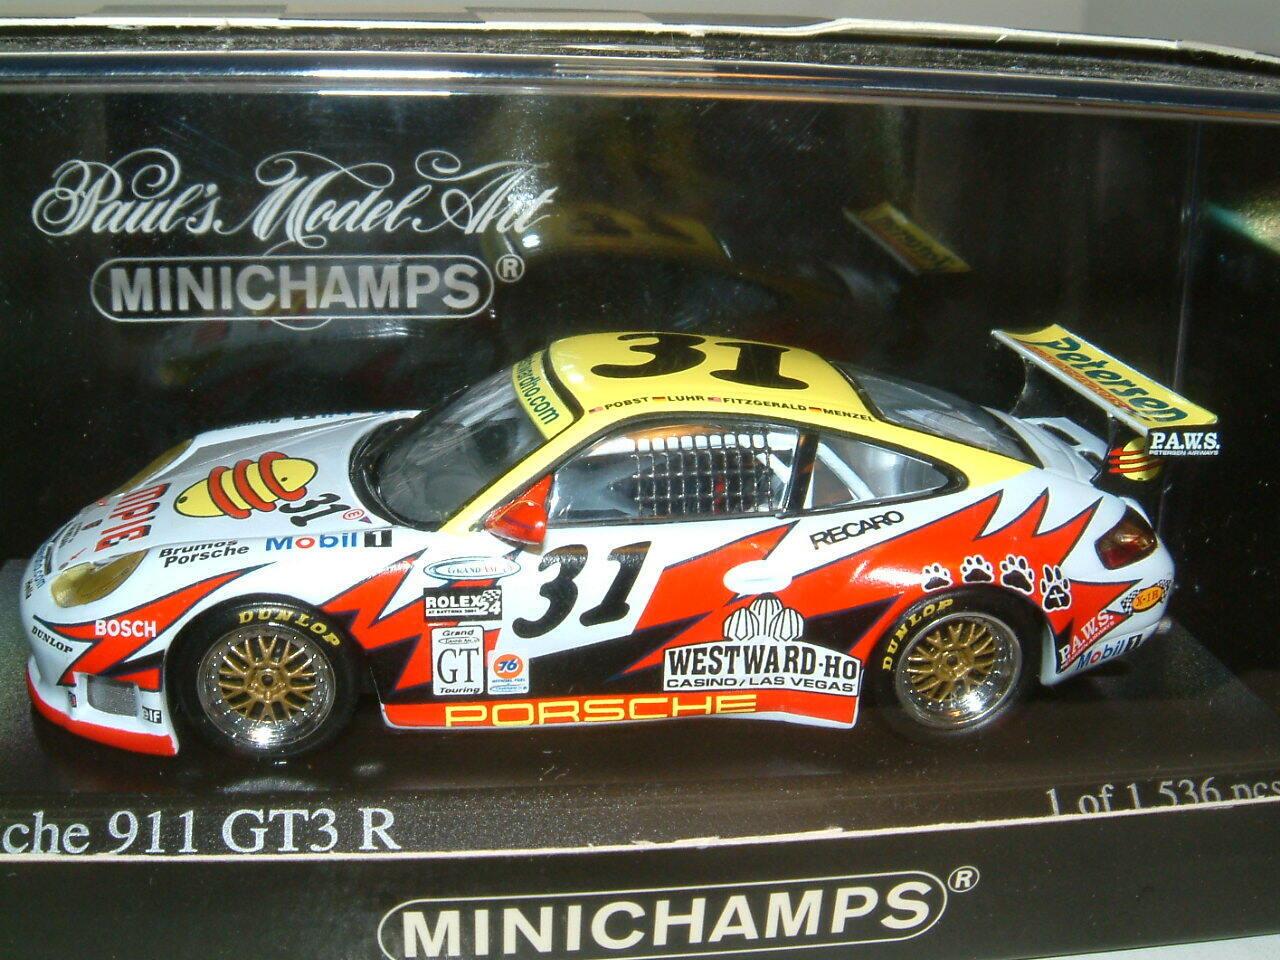 1  43 PORSCHE 911 GT3R DAYTONA, GT WIN, LUHR  FITZGERALD. MINISTAMPS